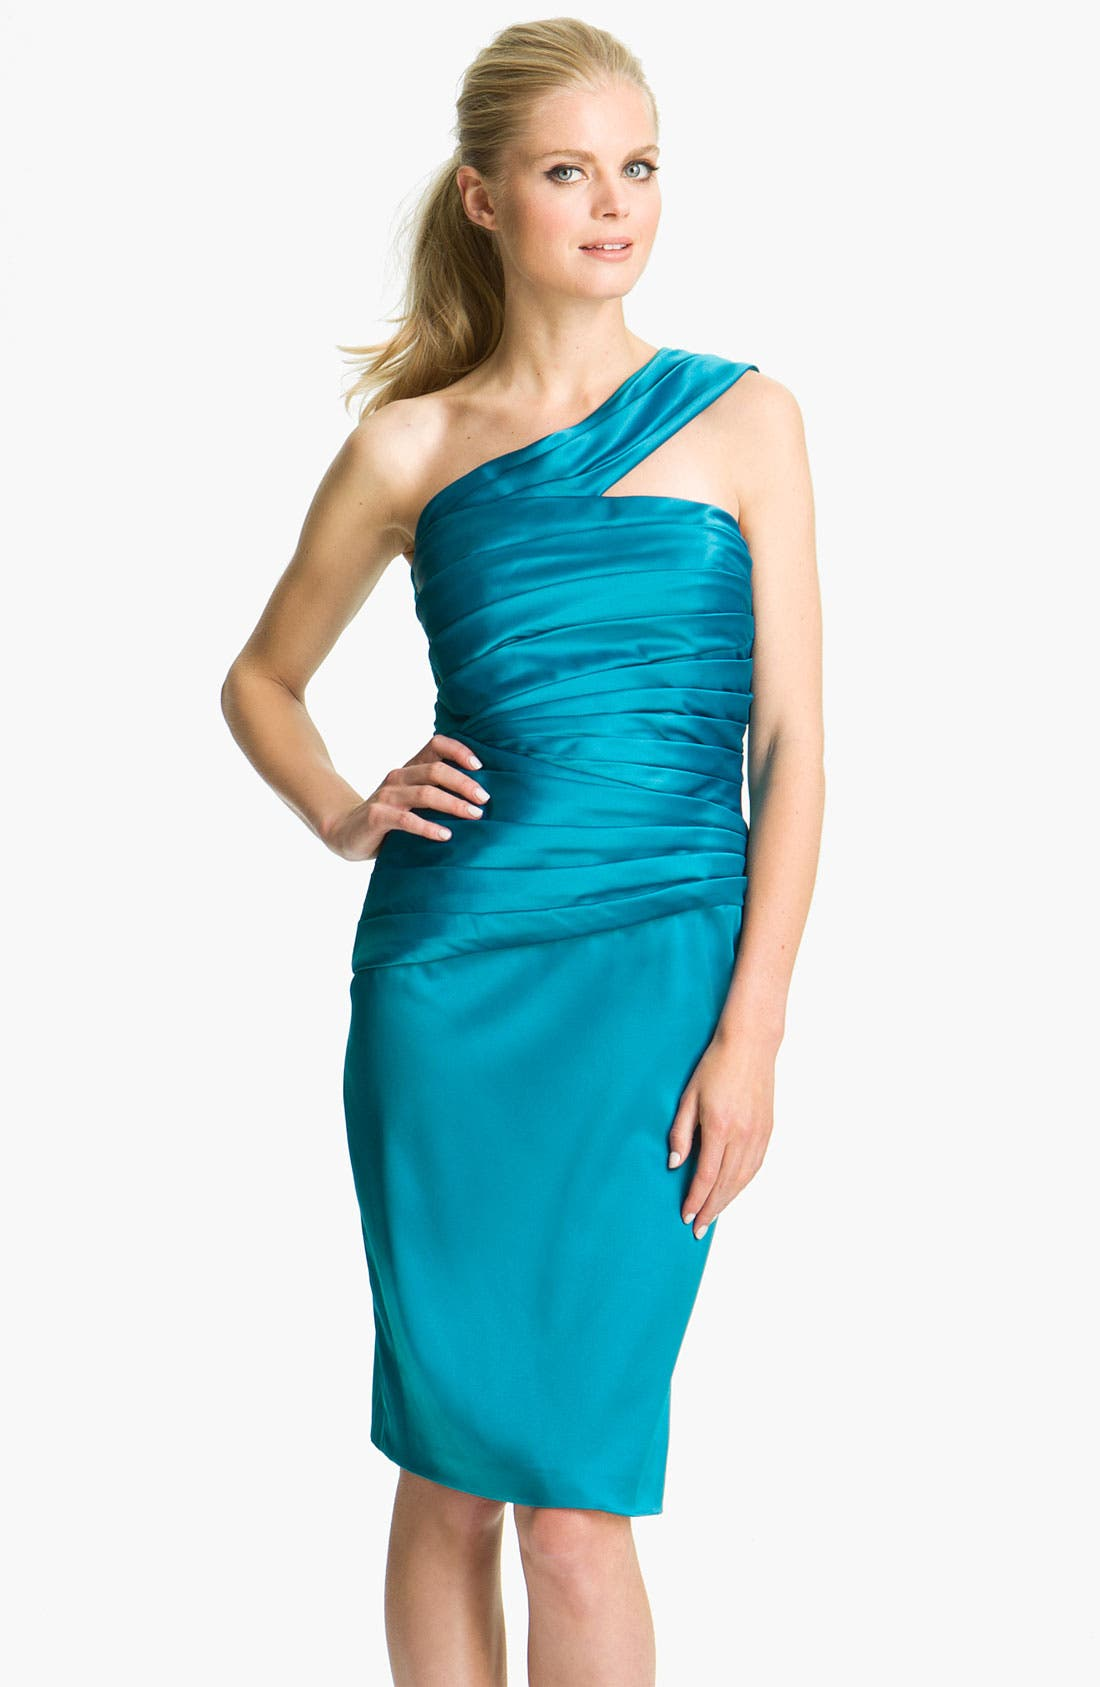 Alternate Image 1 Selected - ML Monique Lhuillier Bridesmaids One Shoulder Satin Dress (Nordstrom Exclusive)